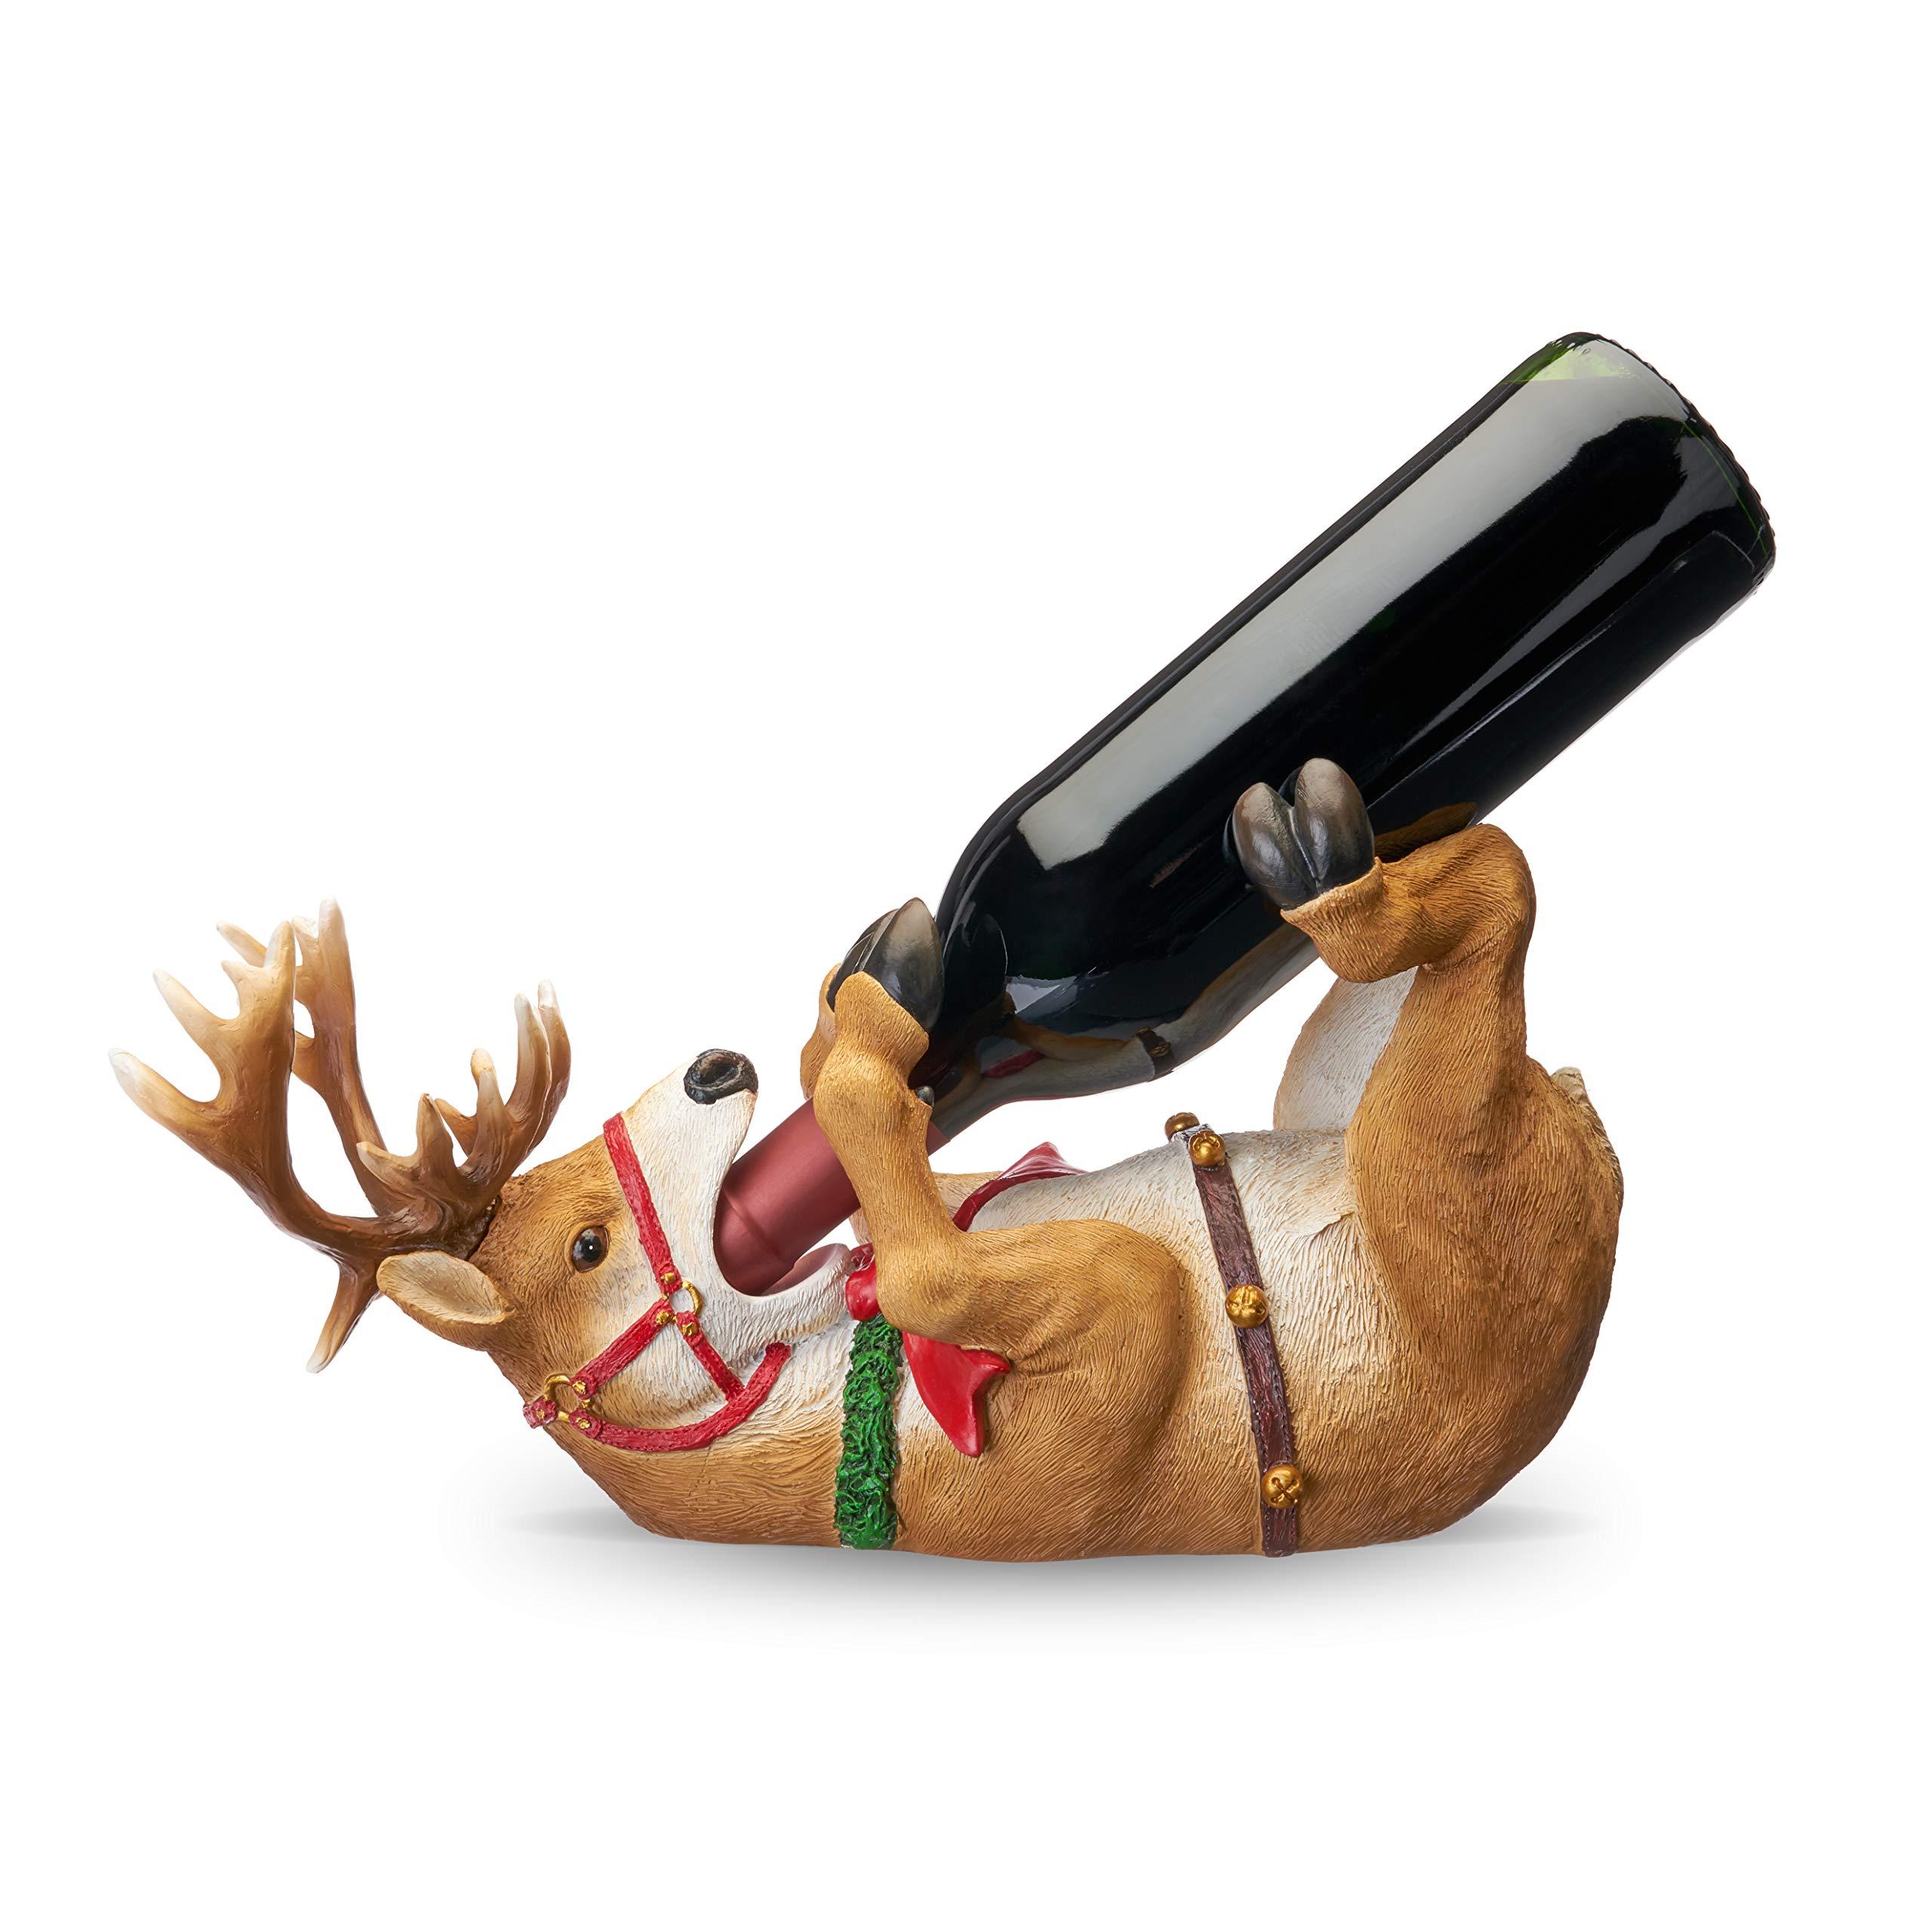 TRUE 5771 Reindeer Wine Bottle Holder, One Size by True